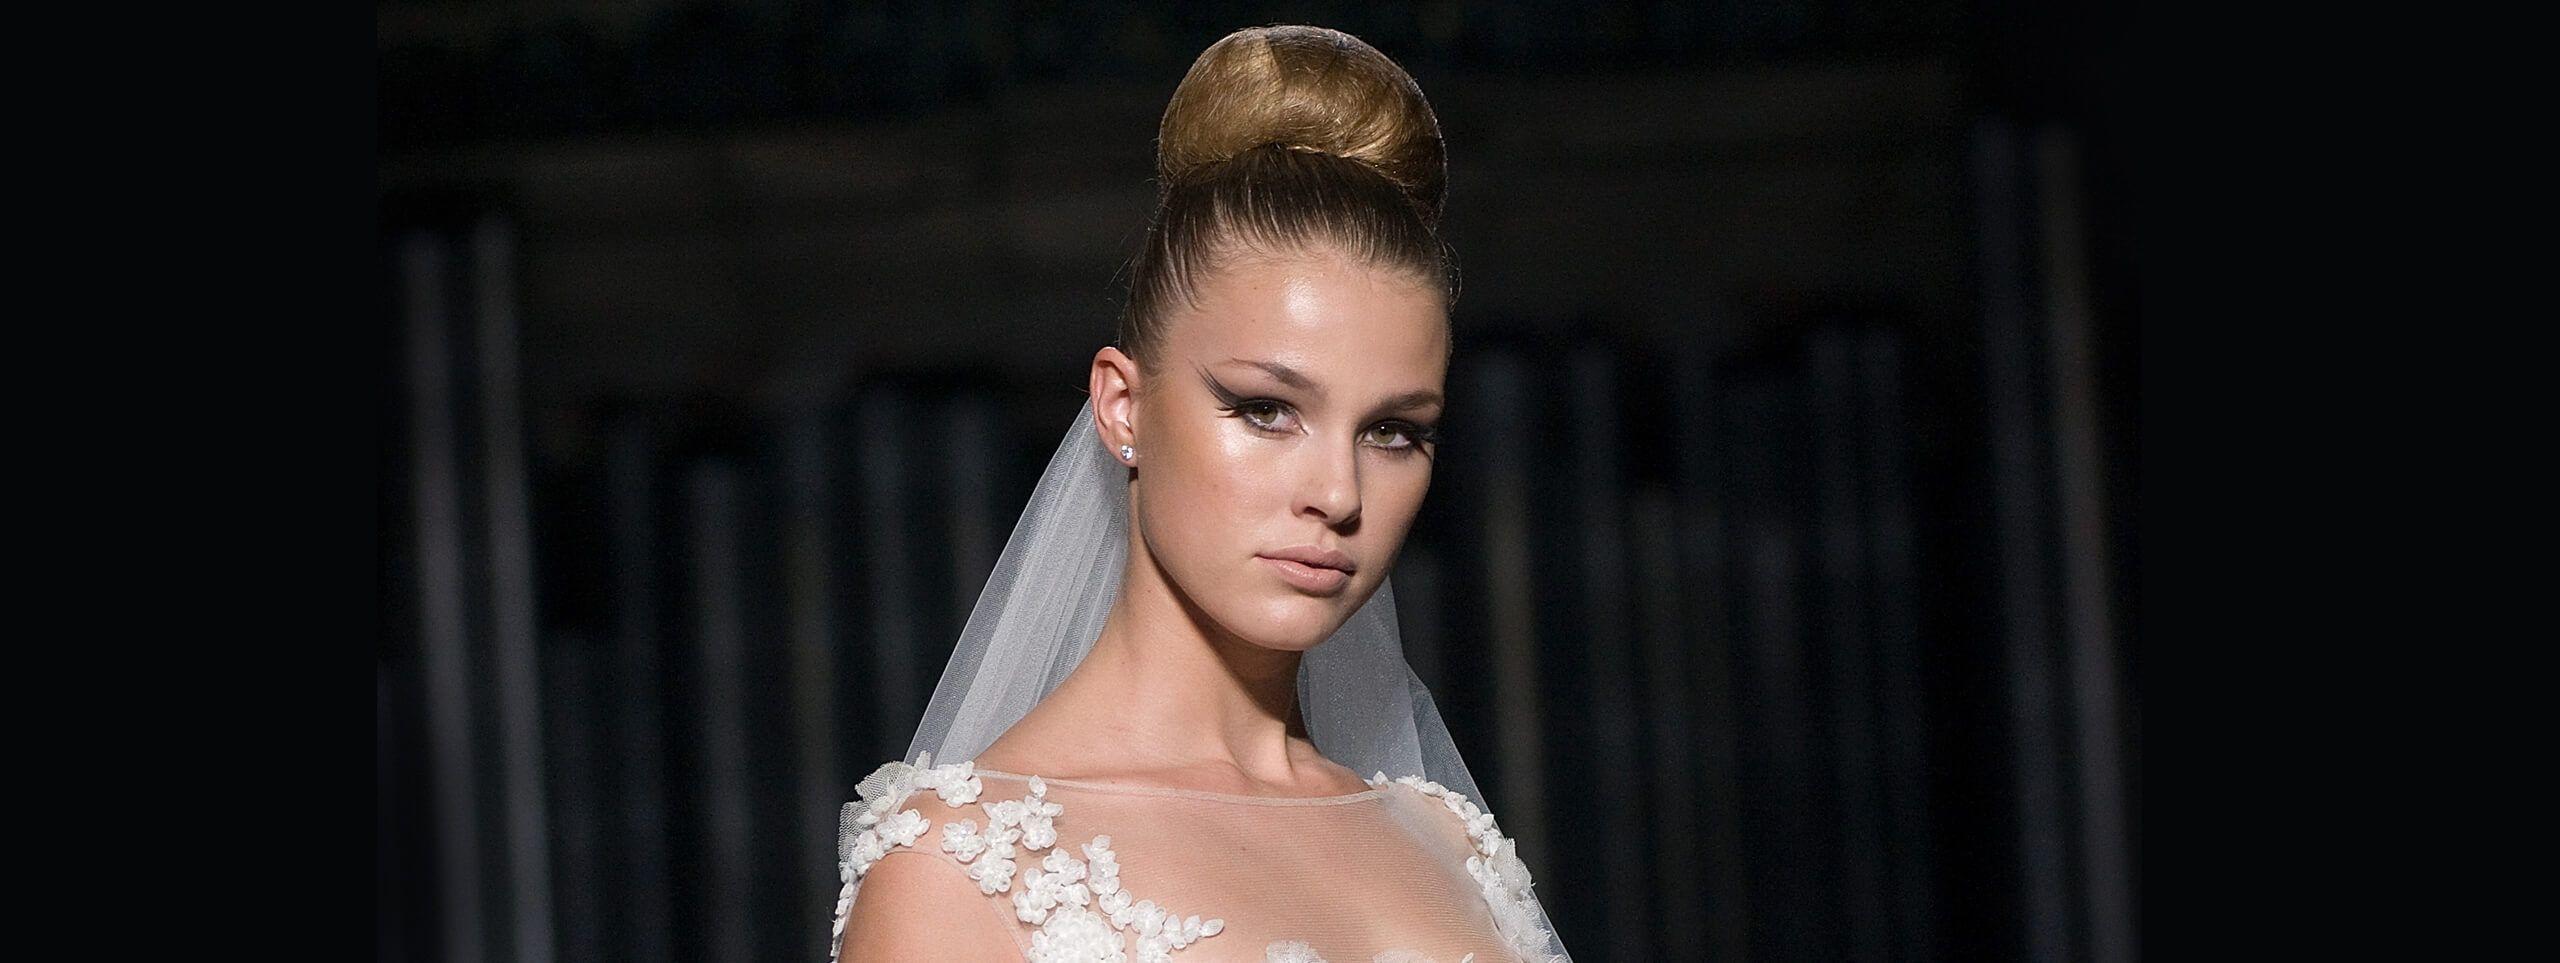 Bride wears hair in high bun updo hairstyle for wedding